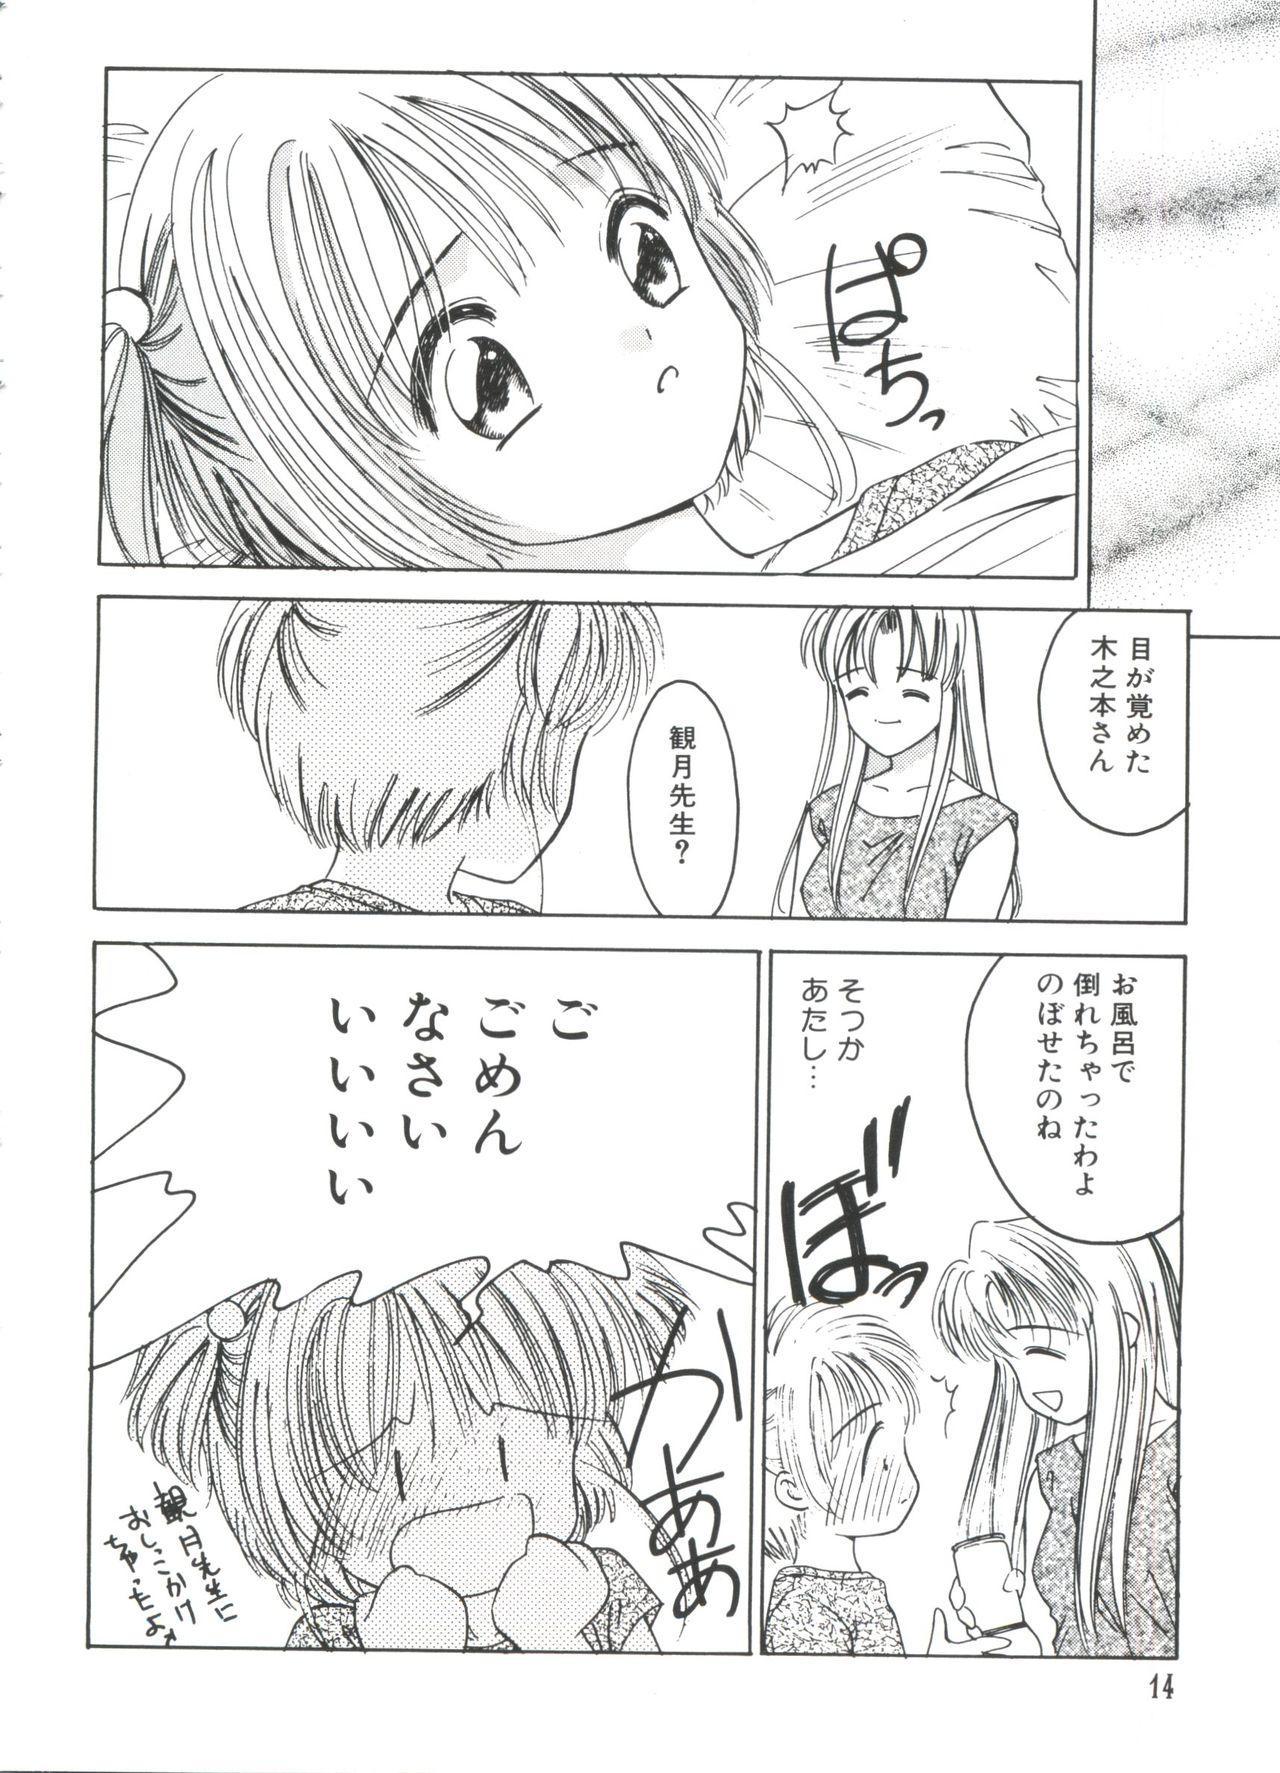 Ero-chan to Issho 2 15